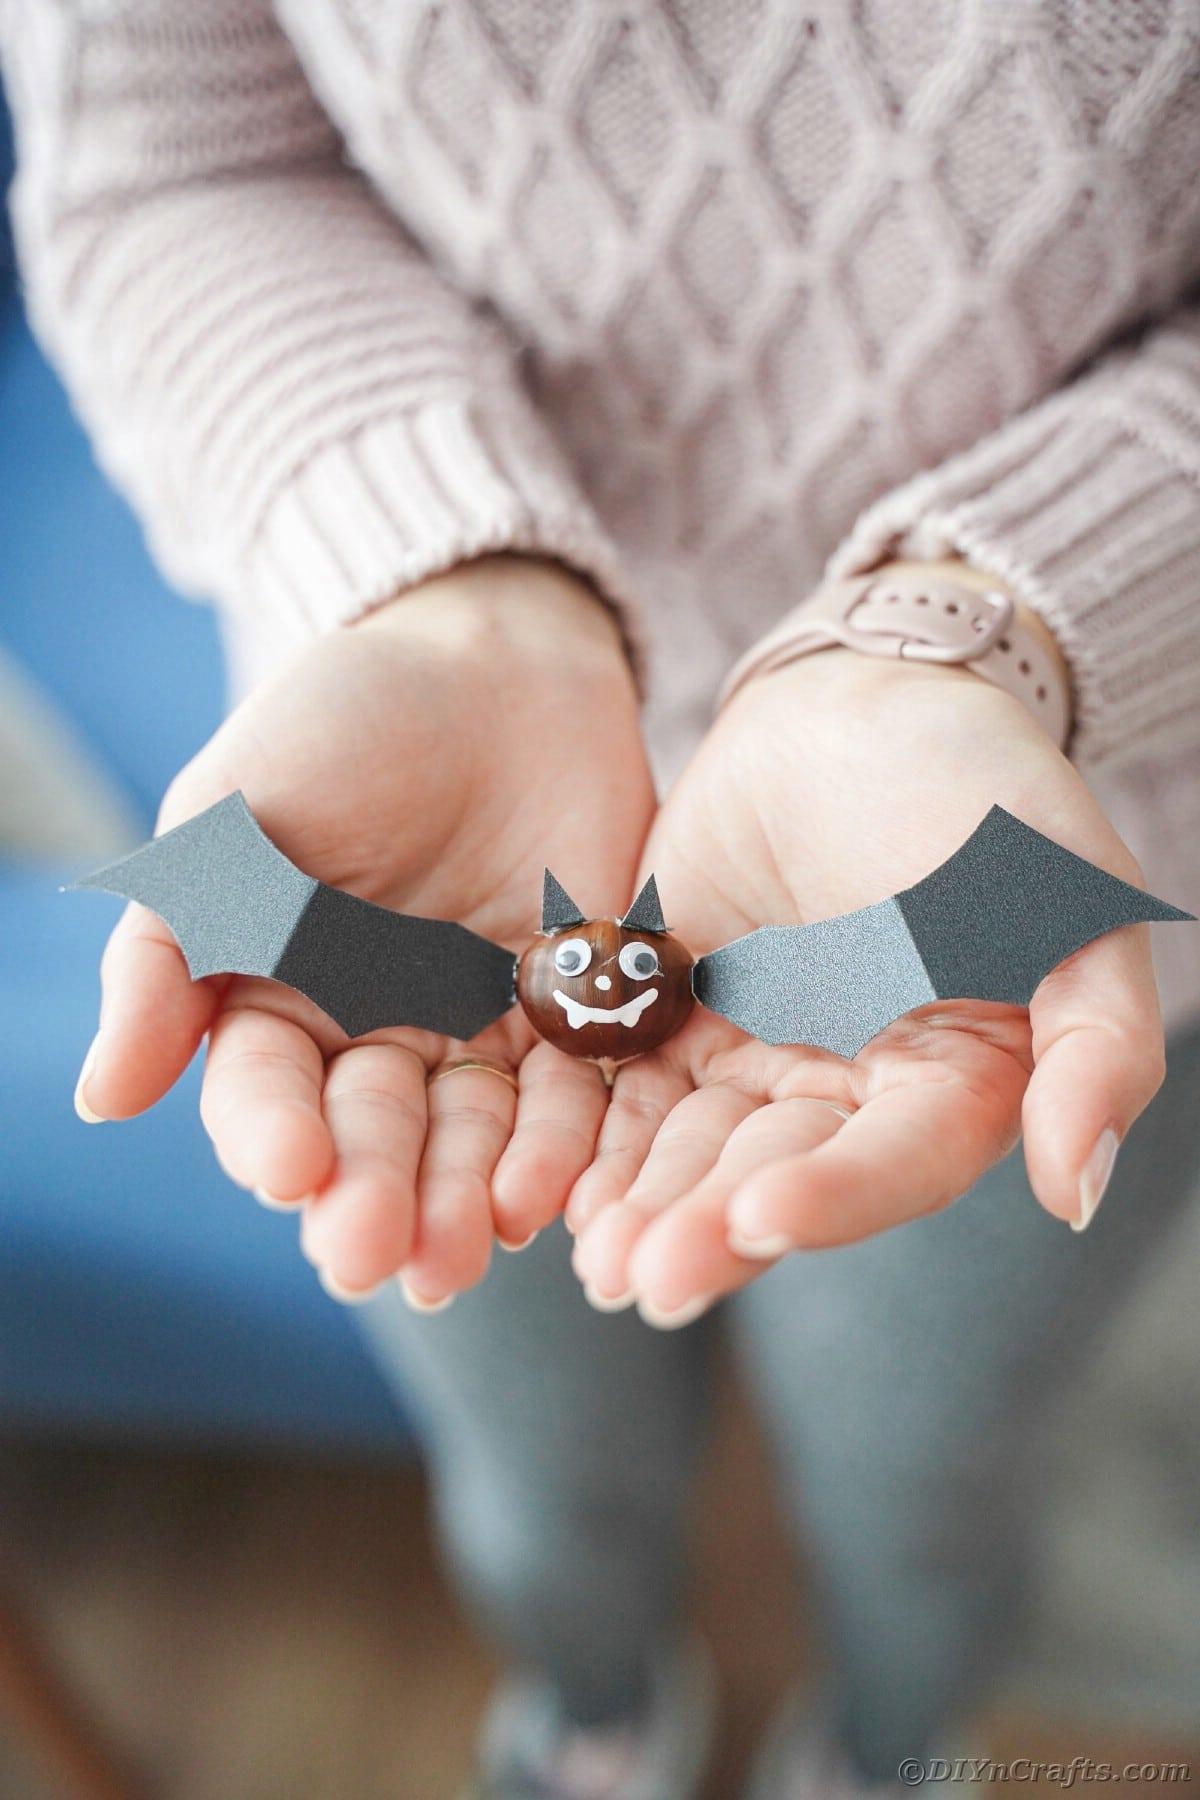 Woman holding chestnut bat in hands